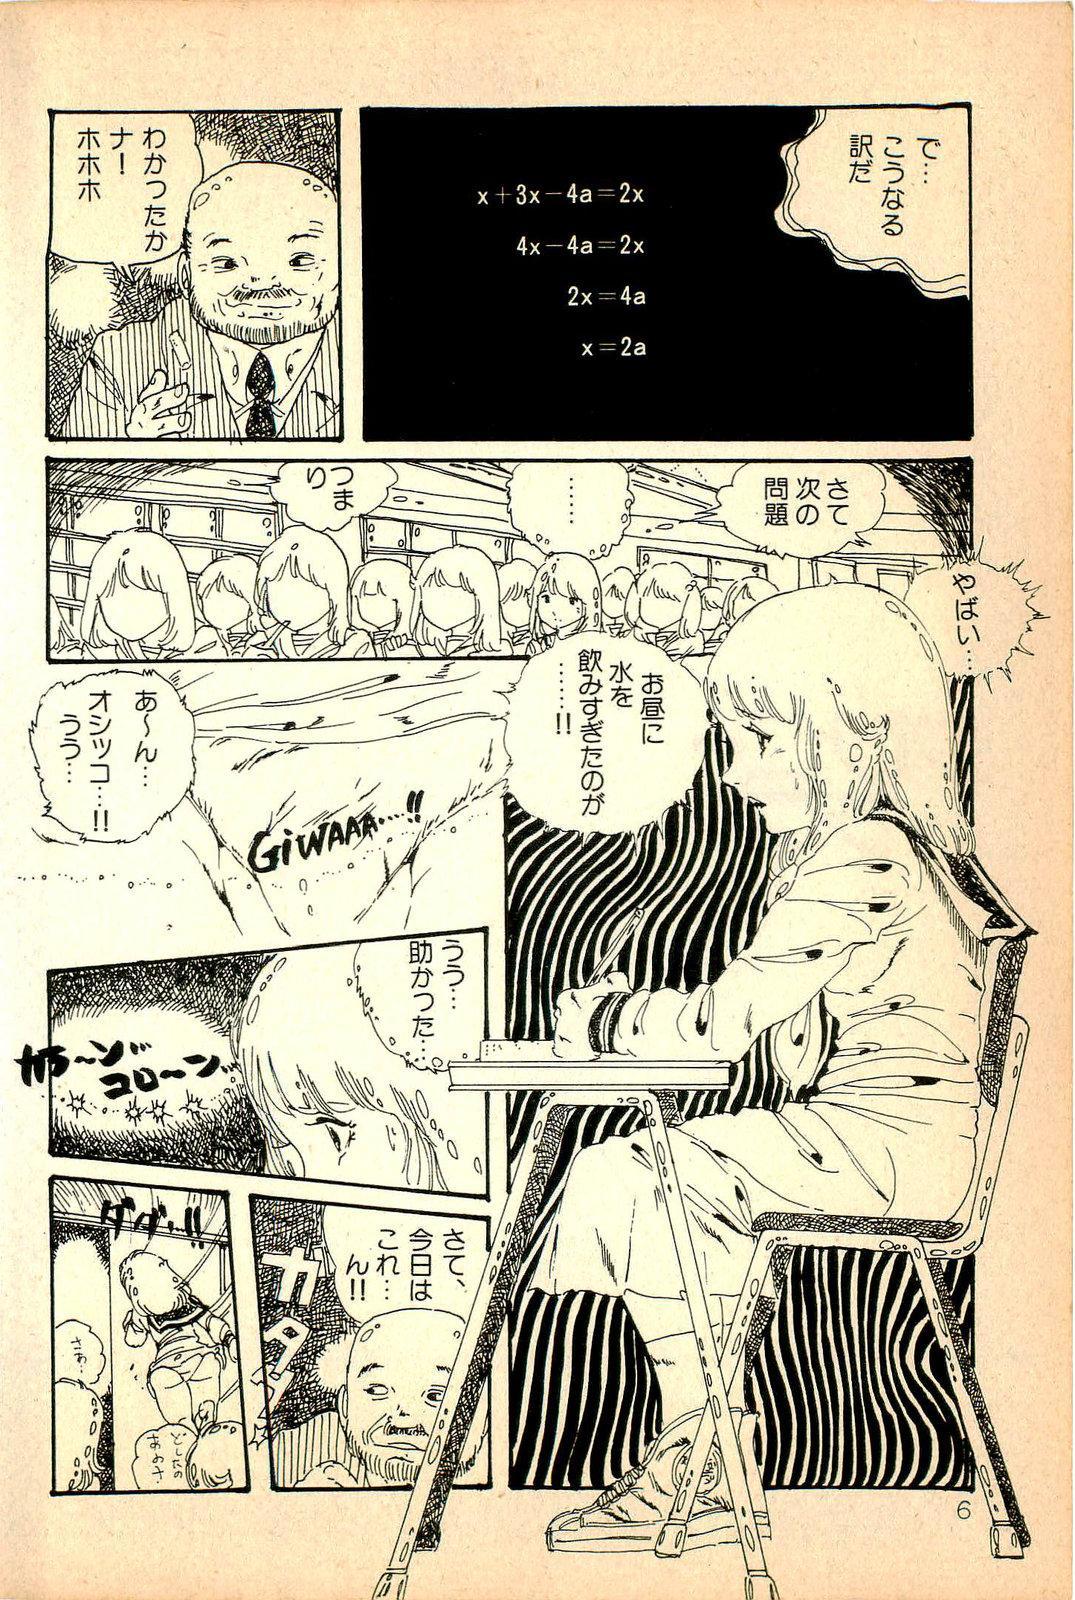 Kimamana Yousei 7